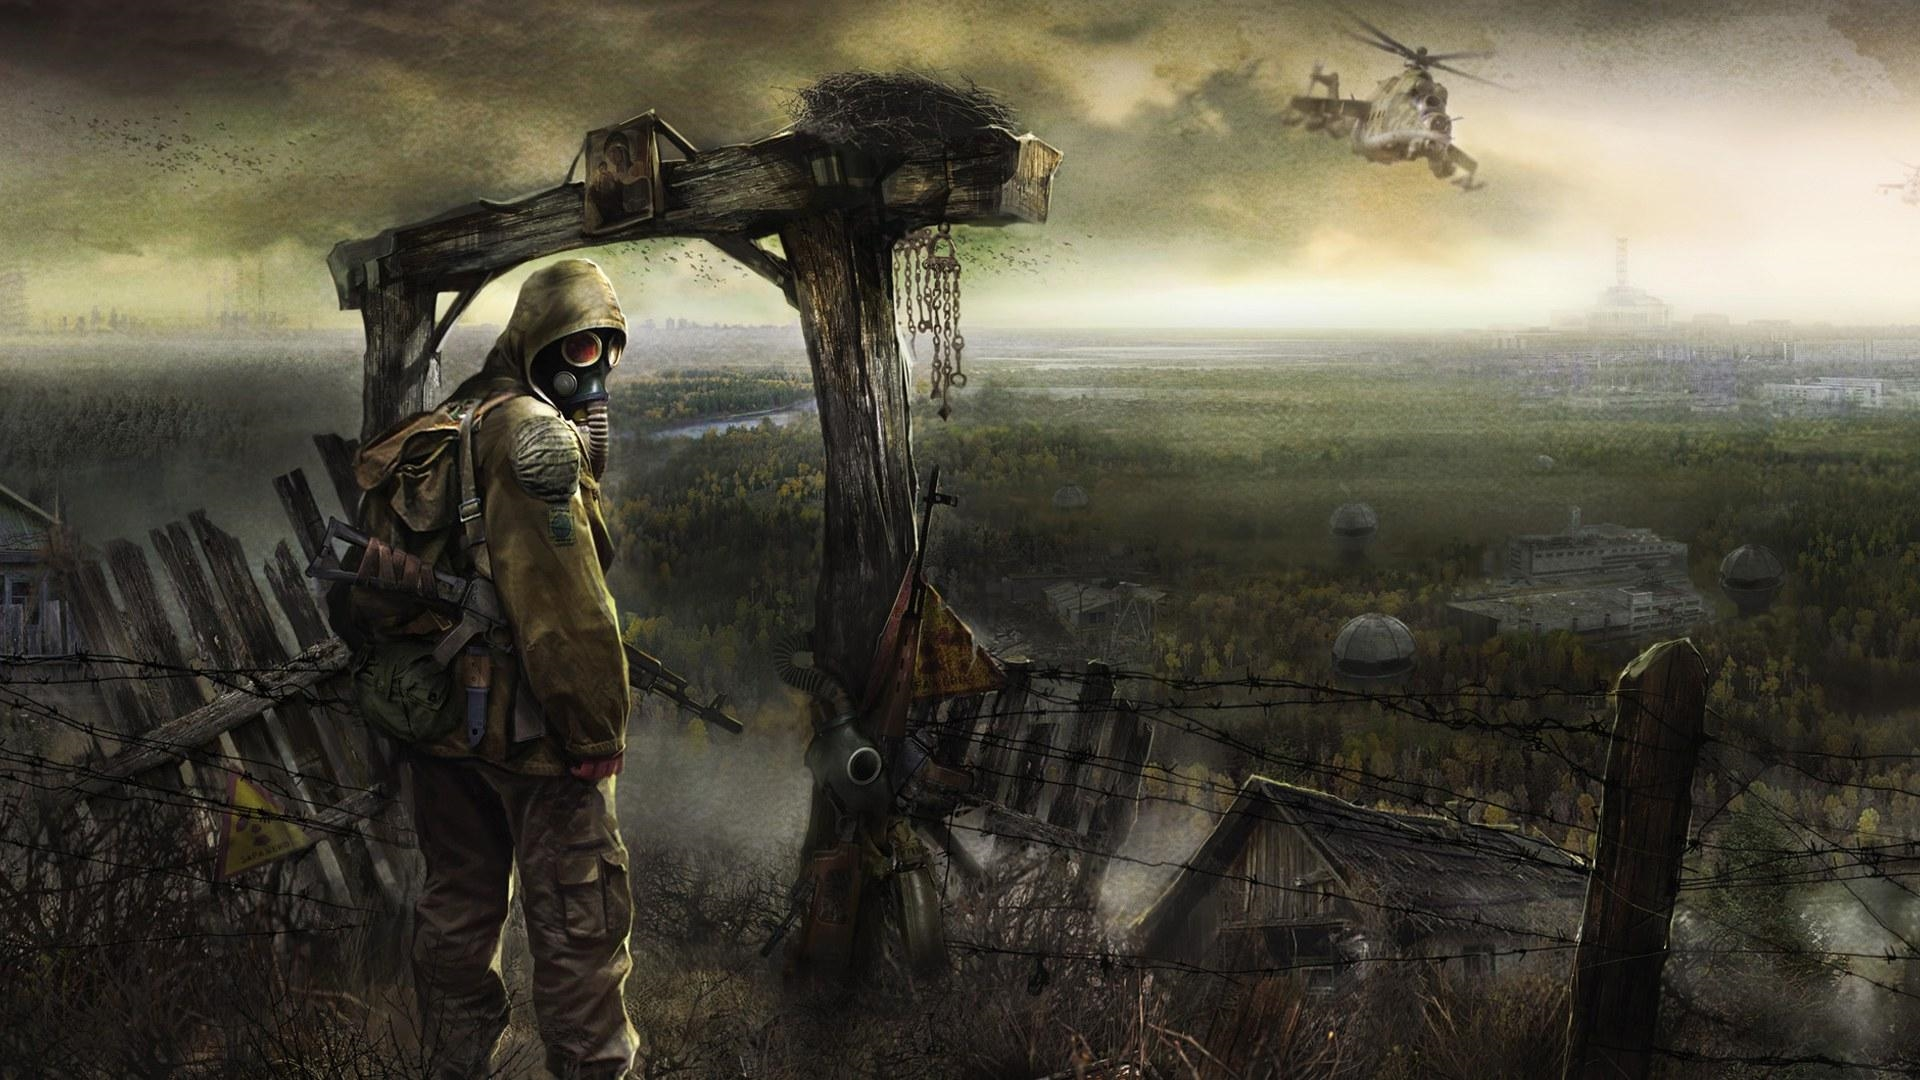 Открытки, крутые картинки игры сталкер